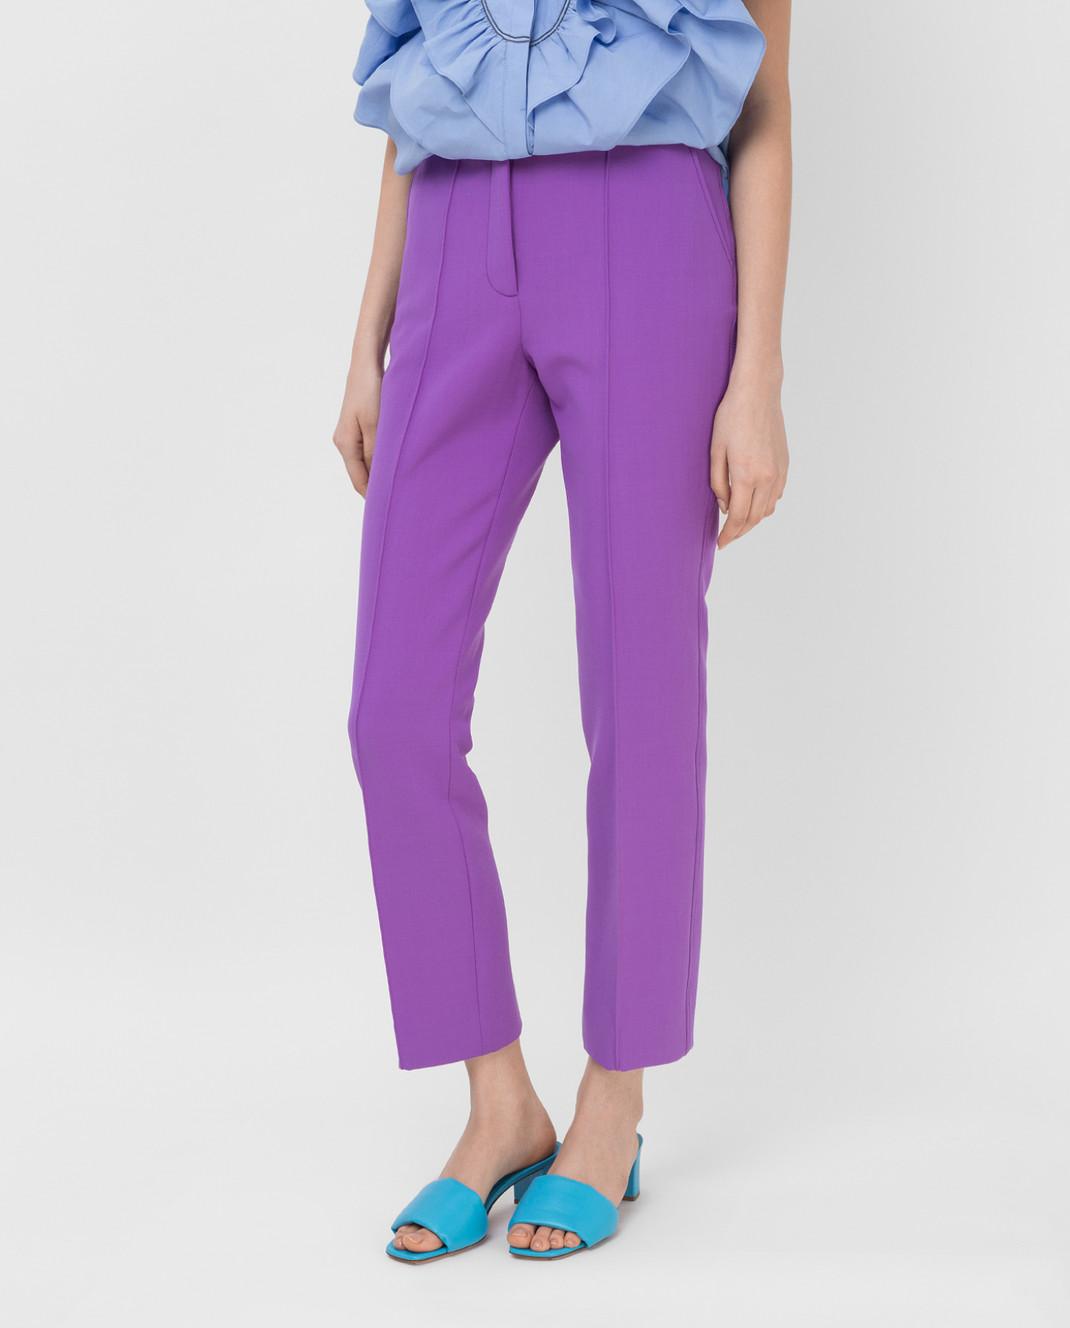 Victoria by Victoria Beckham Фиолетовые брюки TRVV101 изображение 3